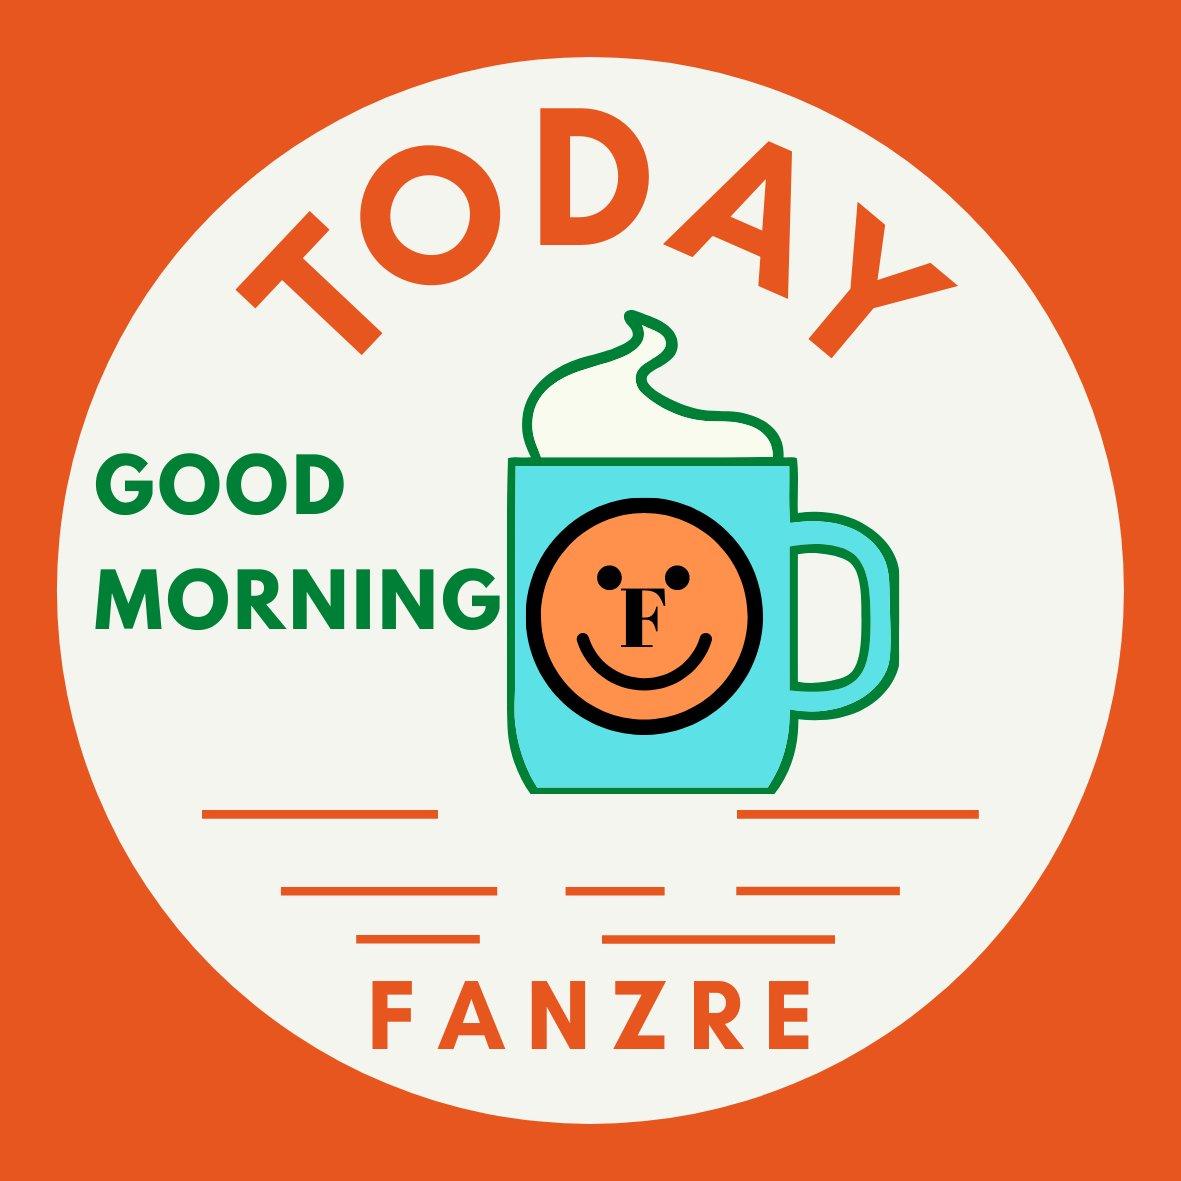 Today...Good Morning Fanzre #theshowloveapp #gujarat #gujarti #maharashtra #madhyapradesh #kerala #karnataka #mumbai #india #mobileapp pic.twitter.com/se5YioZtD9